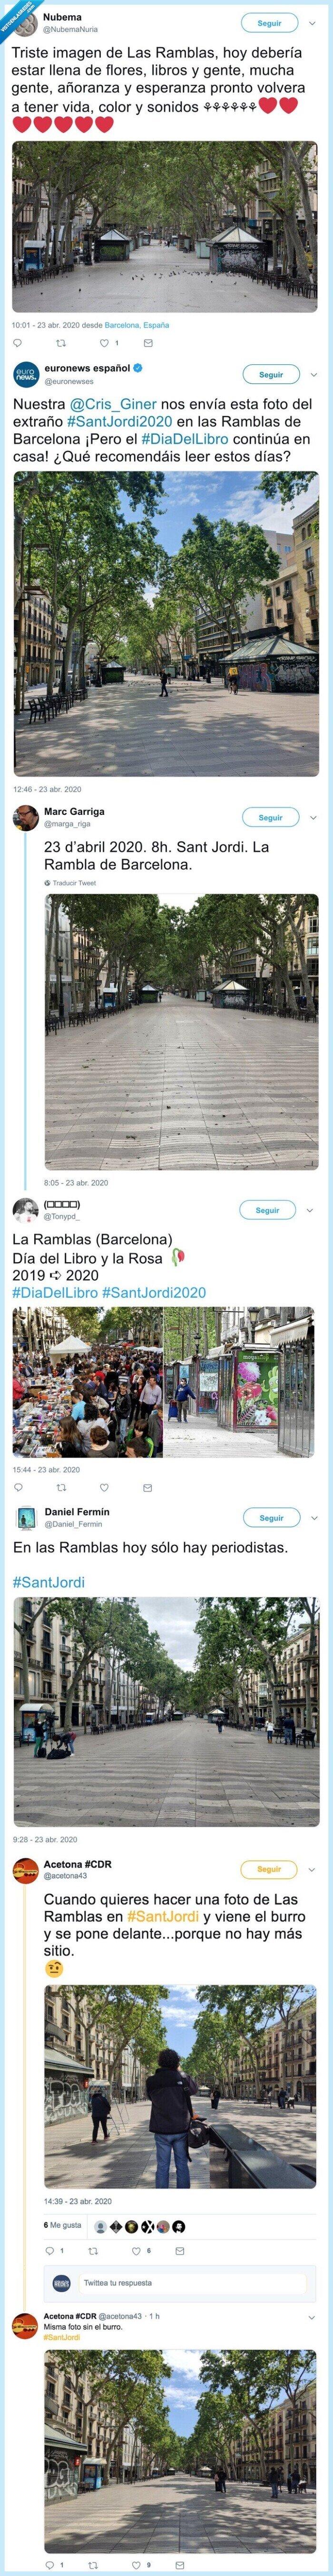 2020,23 de abril,barcelona,ramblas,sant jordi